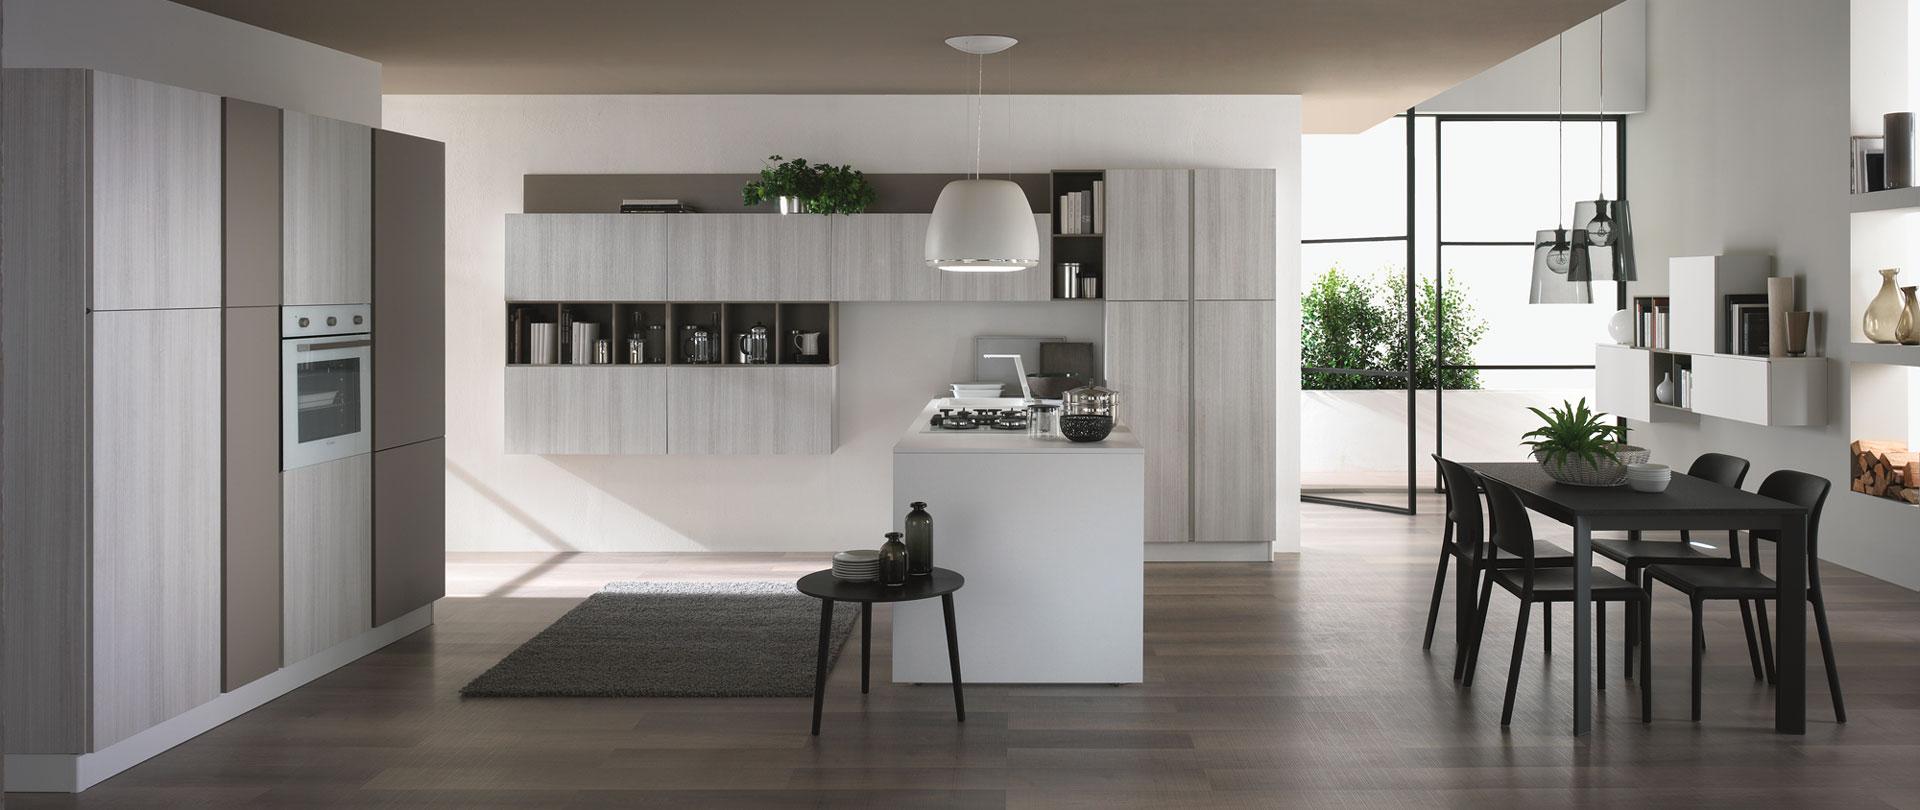 evo-cucina-agora-bianco-stone-fango-opaco